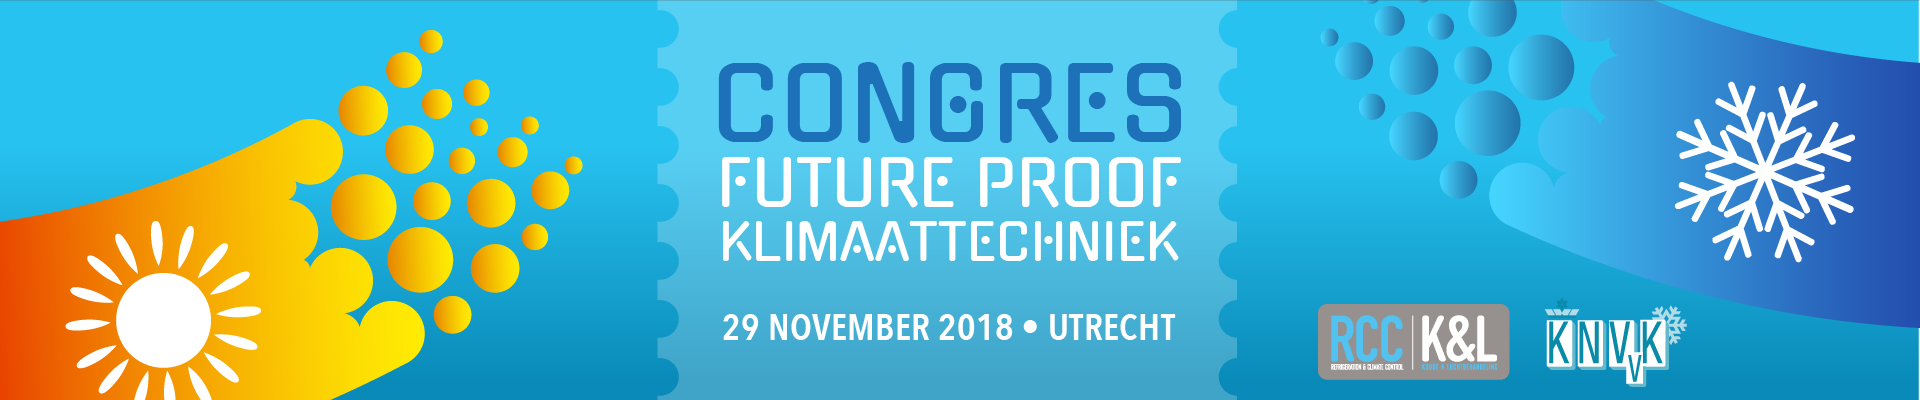 Futureproof klimaattechniek